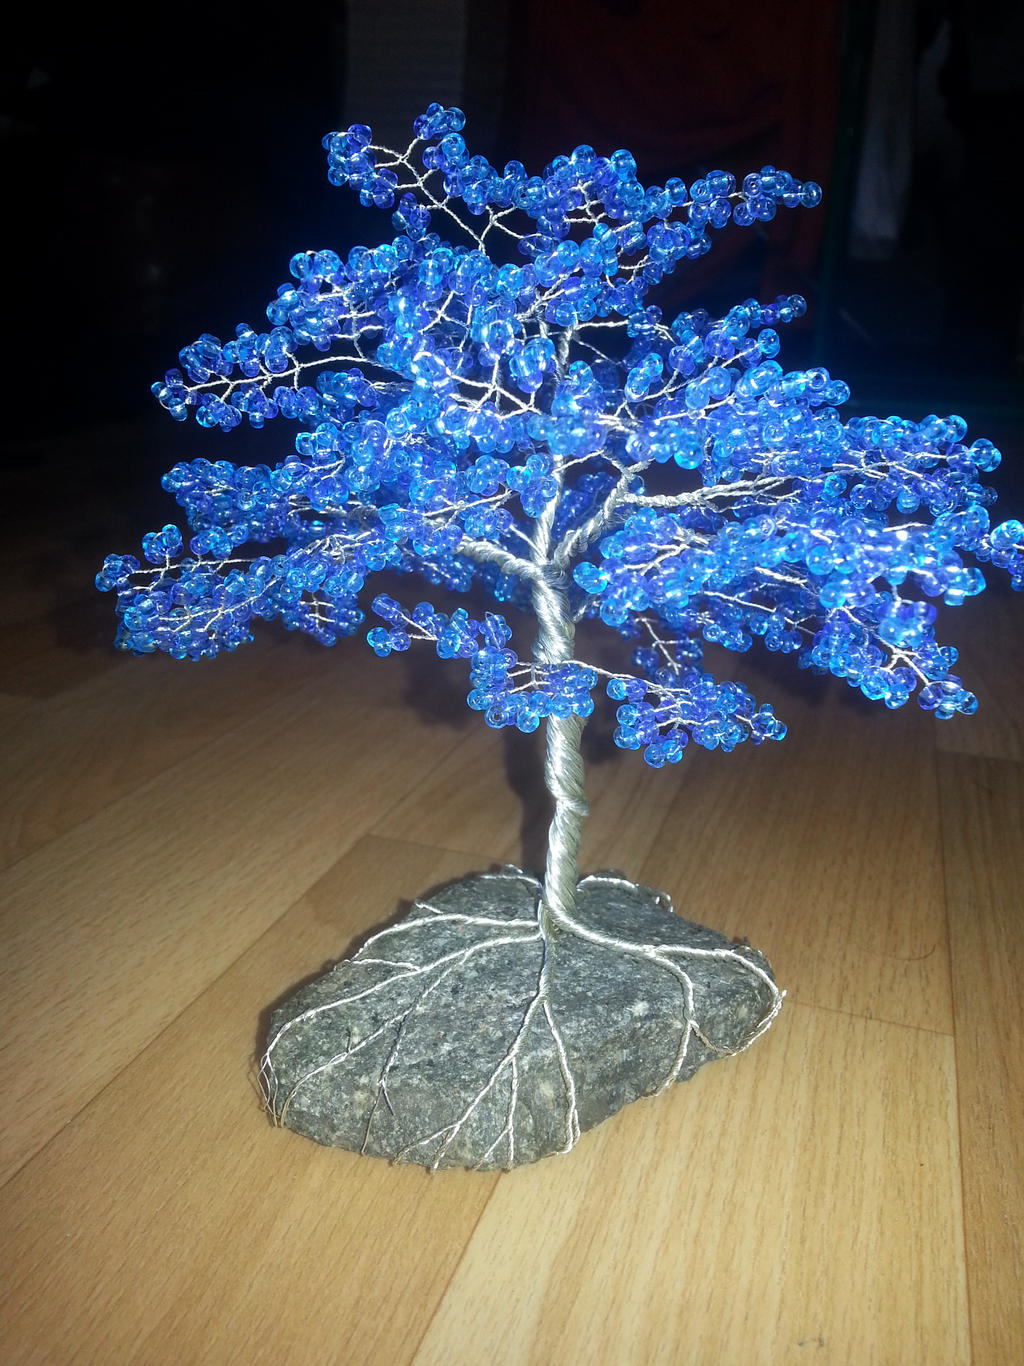 Baum 2 Blau by Karo1987